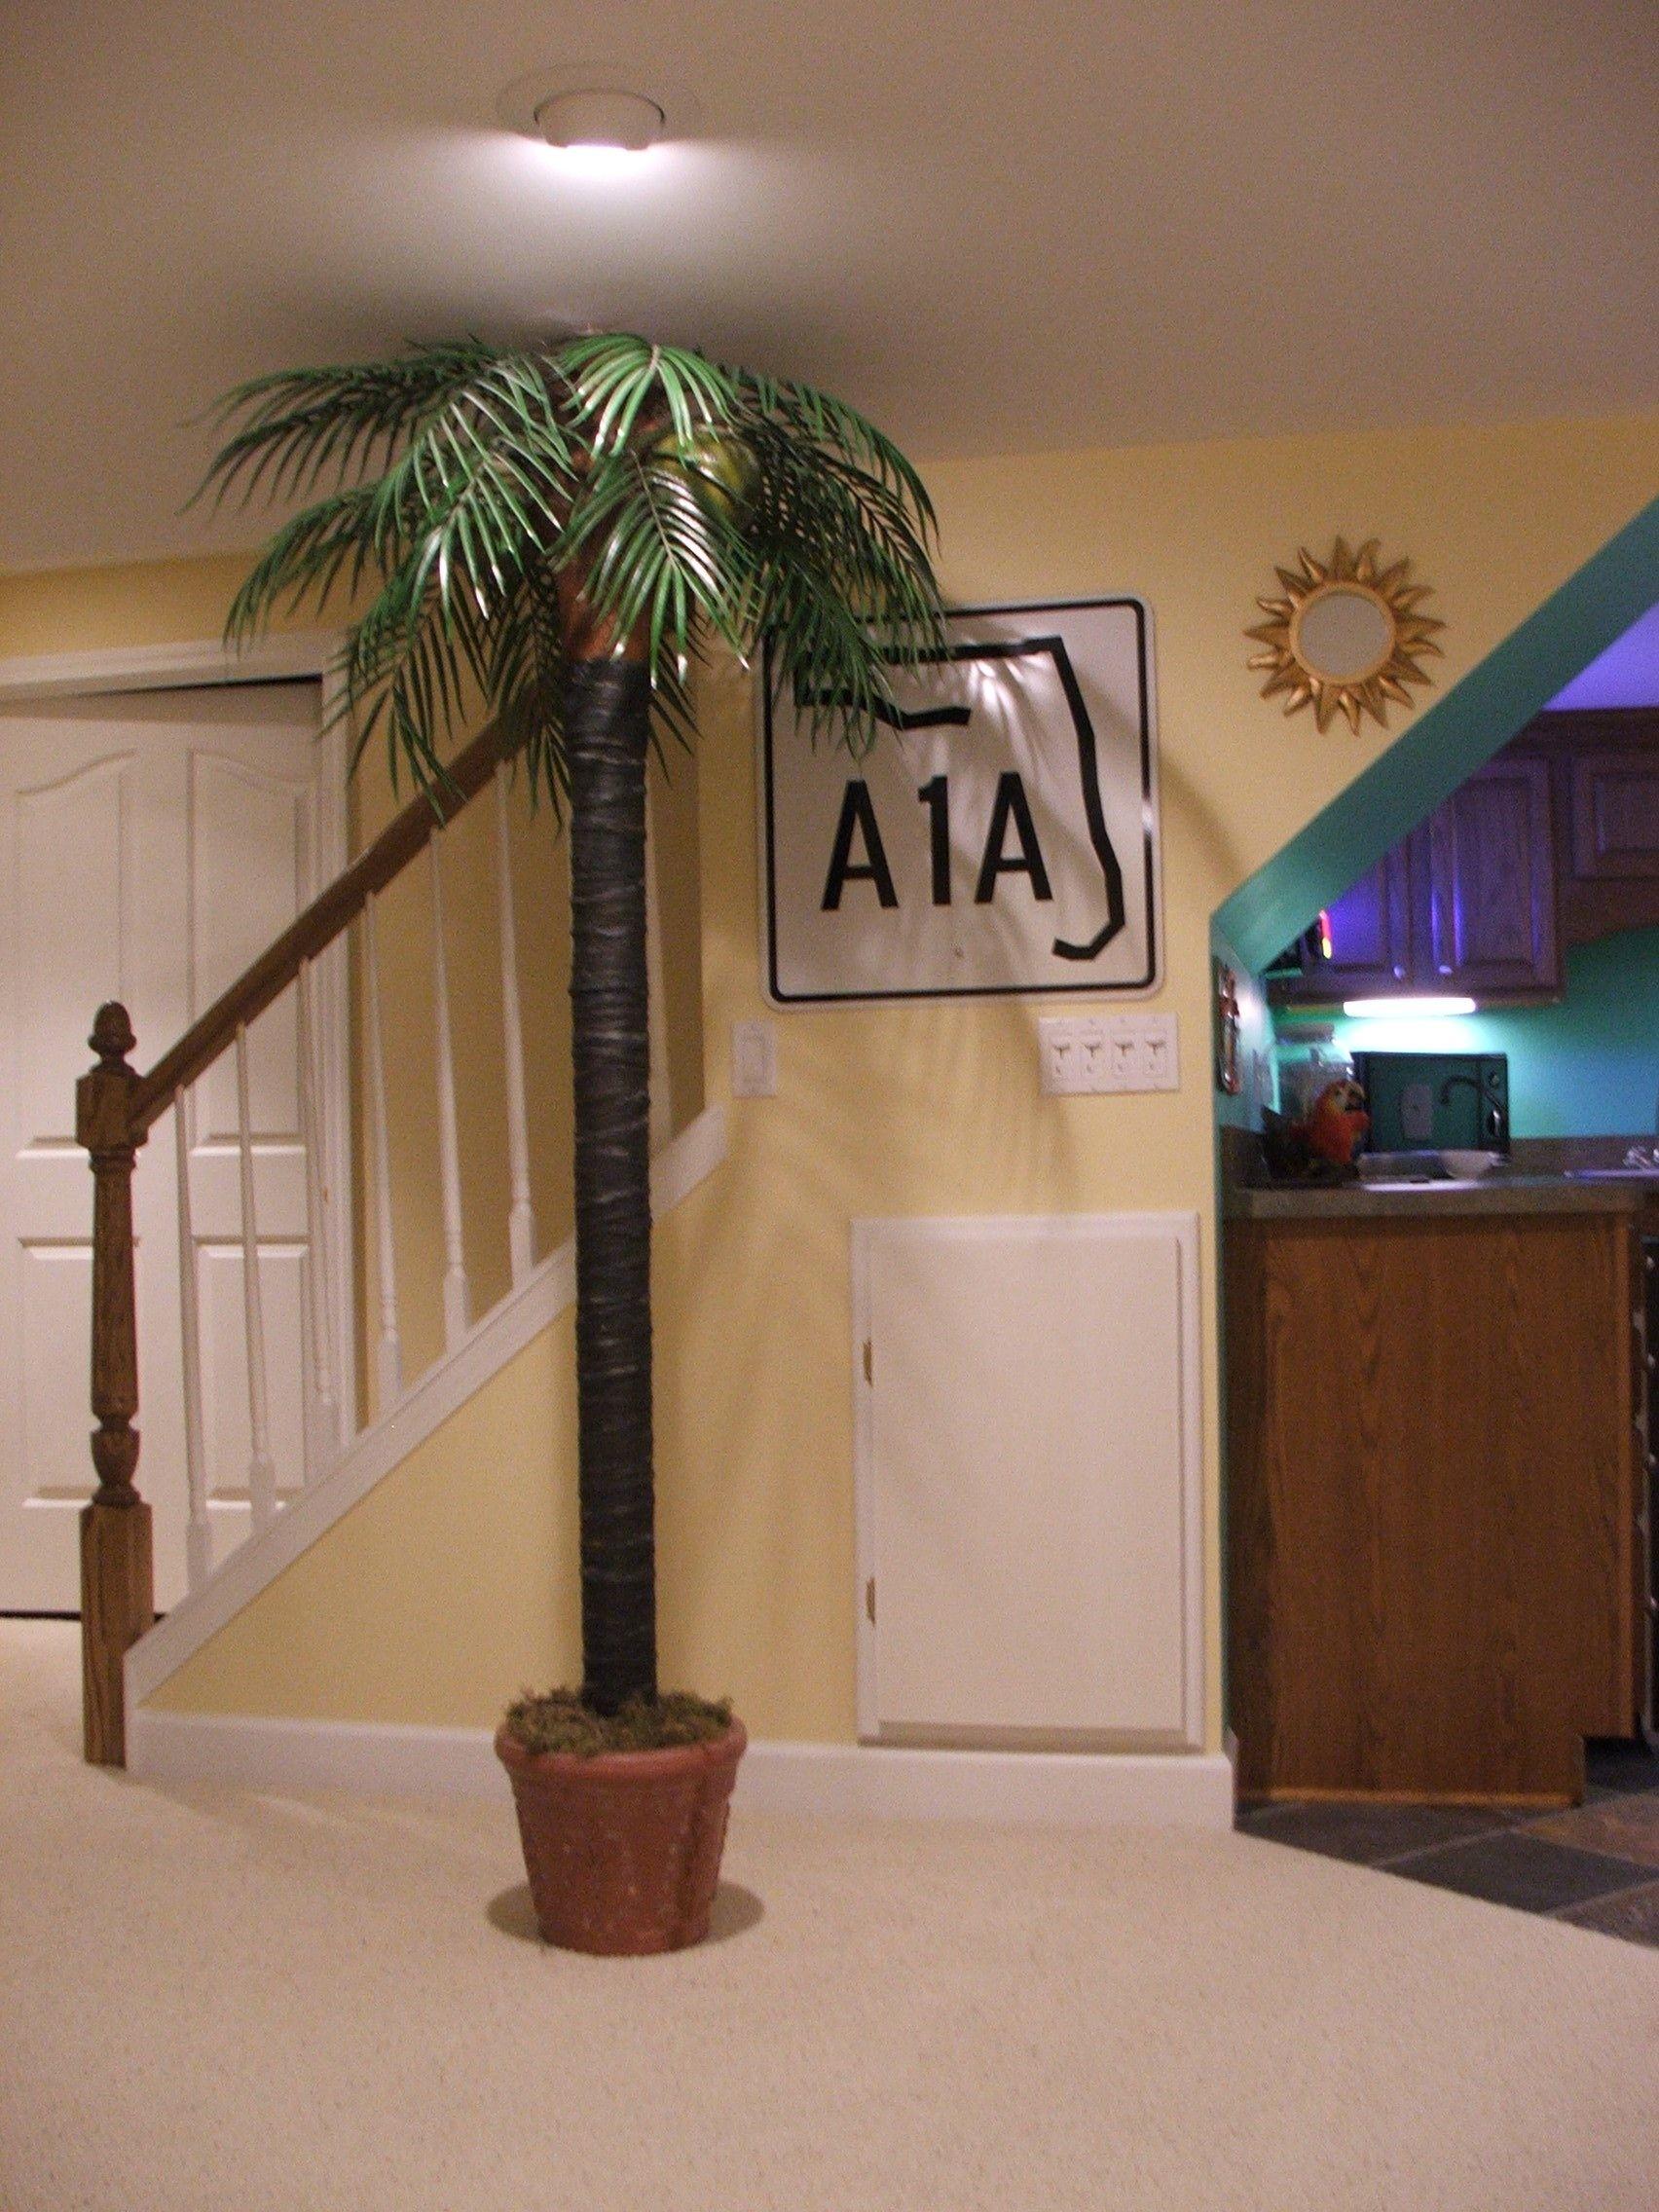 Basement Pole Cover Ideas Part - 30: Hide A Basement Post With A Palm Tree